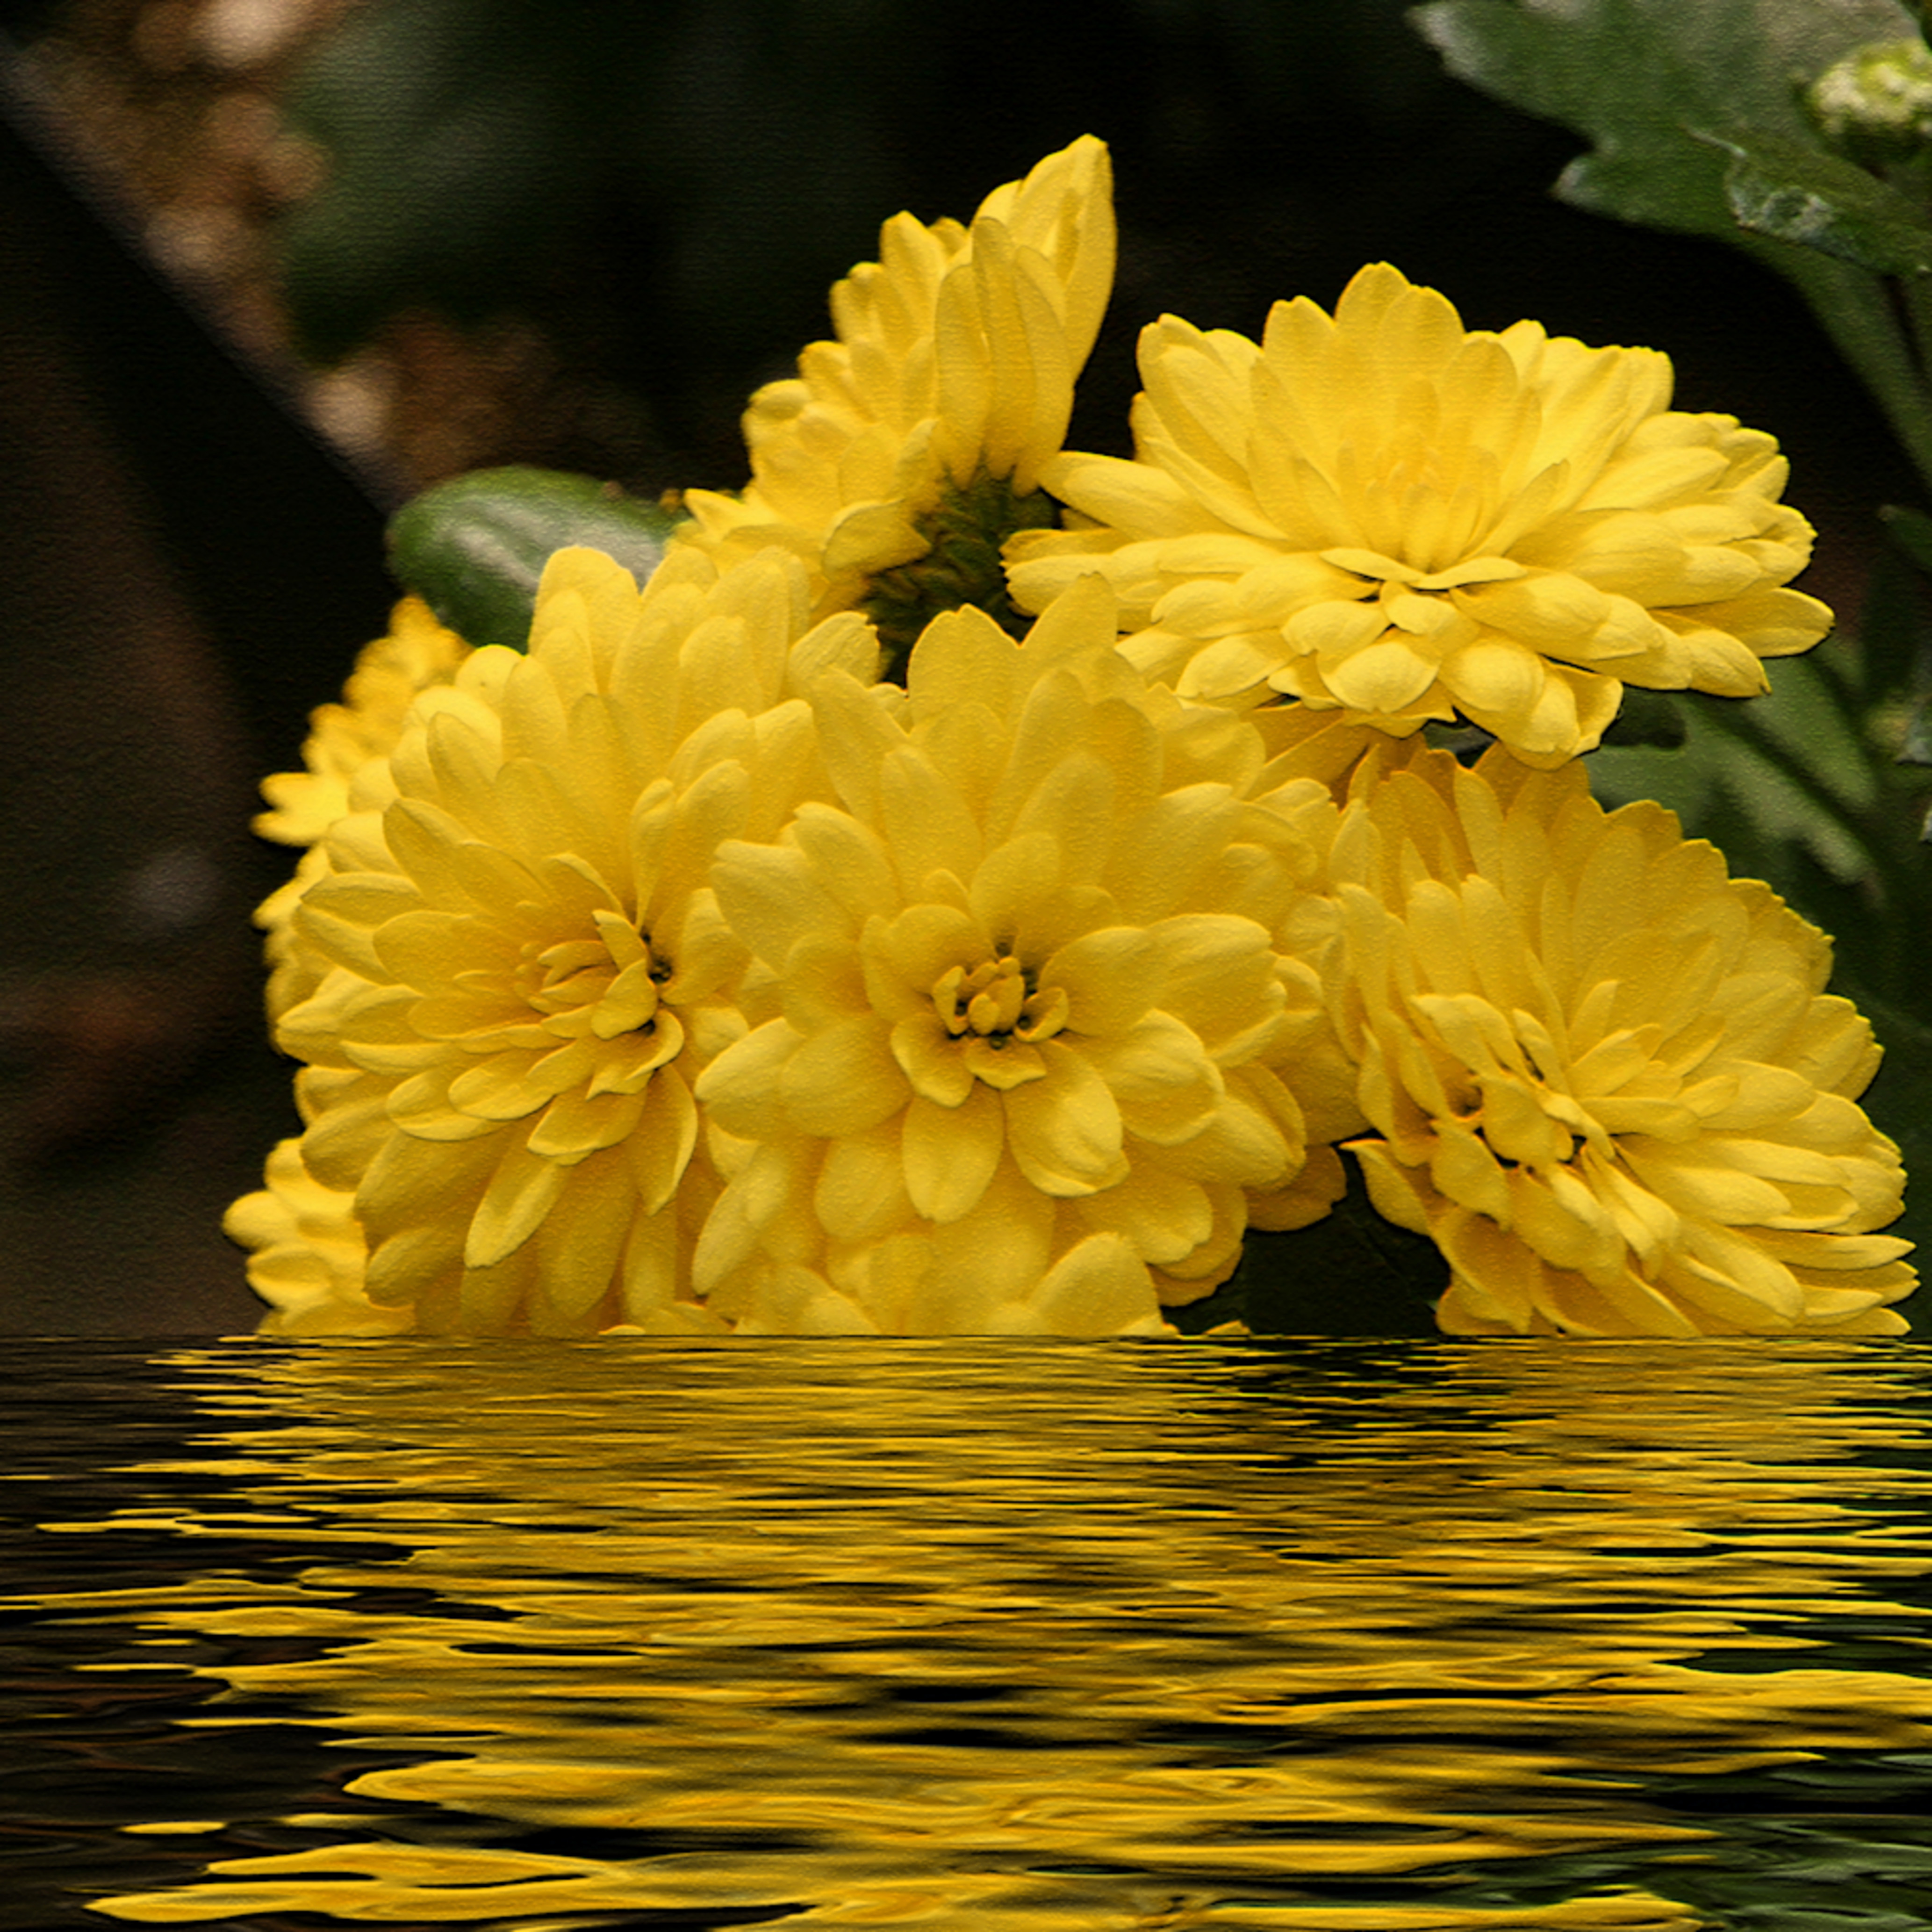 Flowers reflections 2 x3pgtb